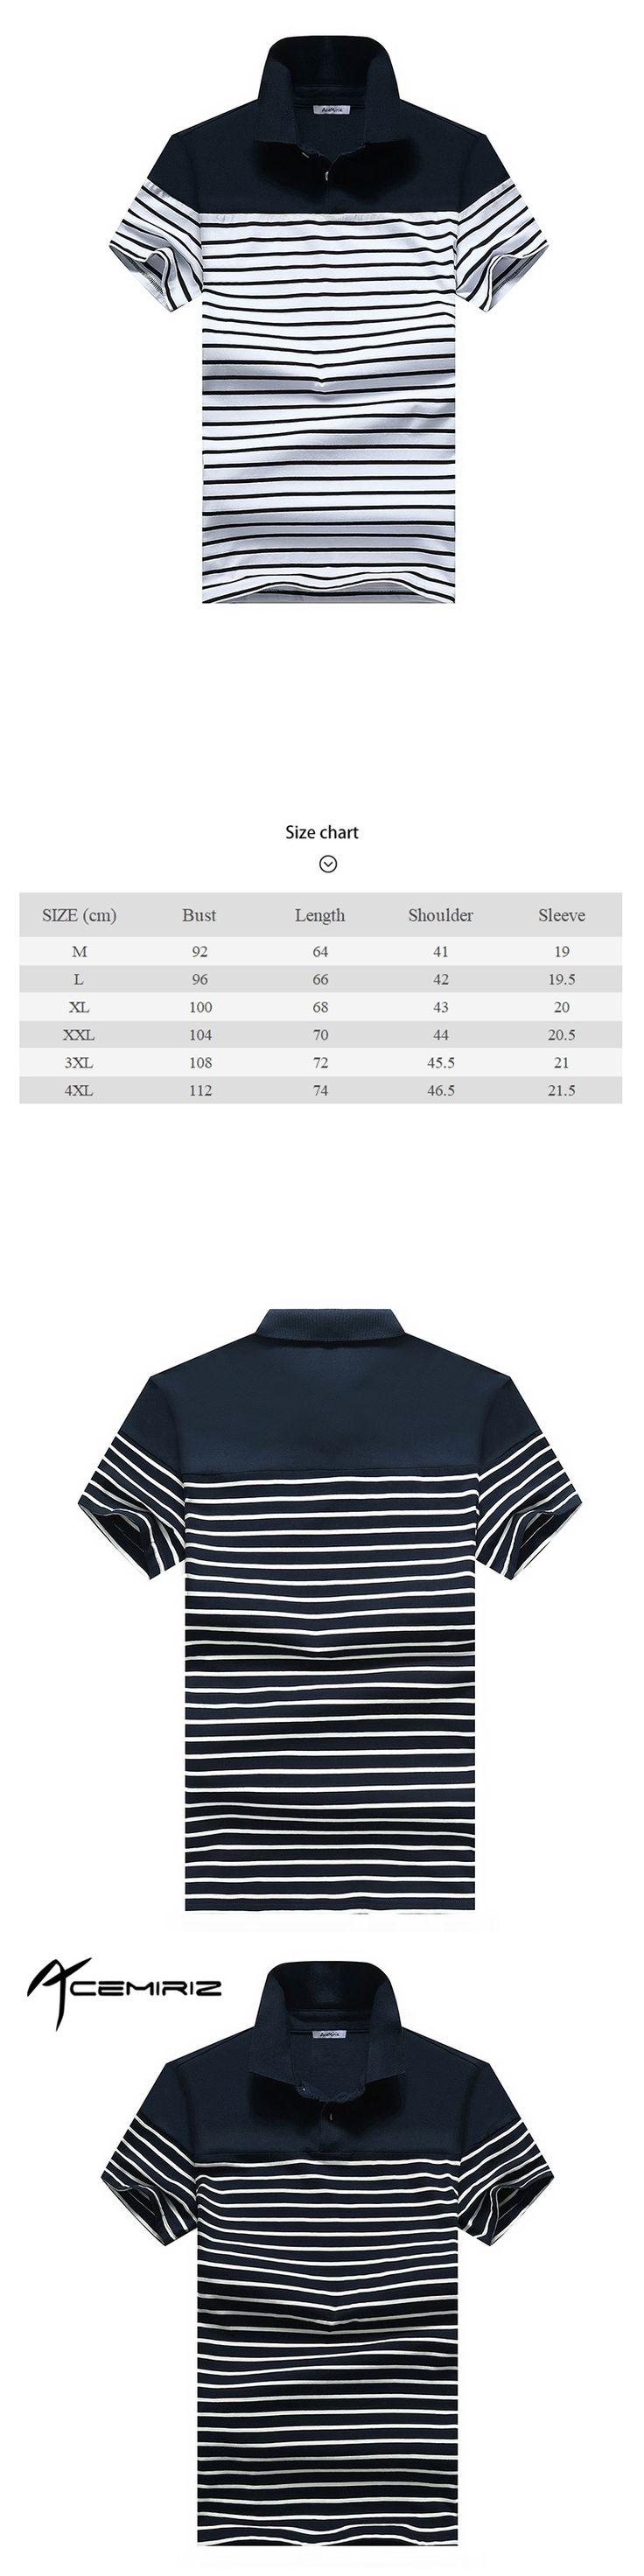 ACEMIRIZ Stripe Polo Shirts Men 2017 New Short Sleeve Striped Polo Shirts For Men Summer Turn-down HT-1732